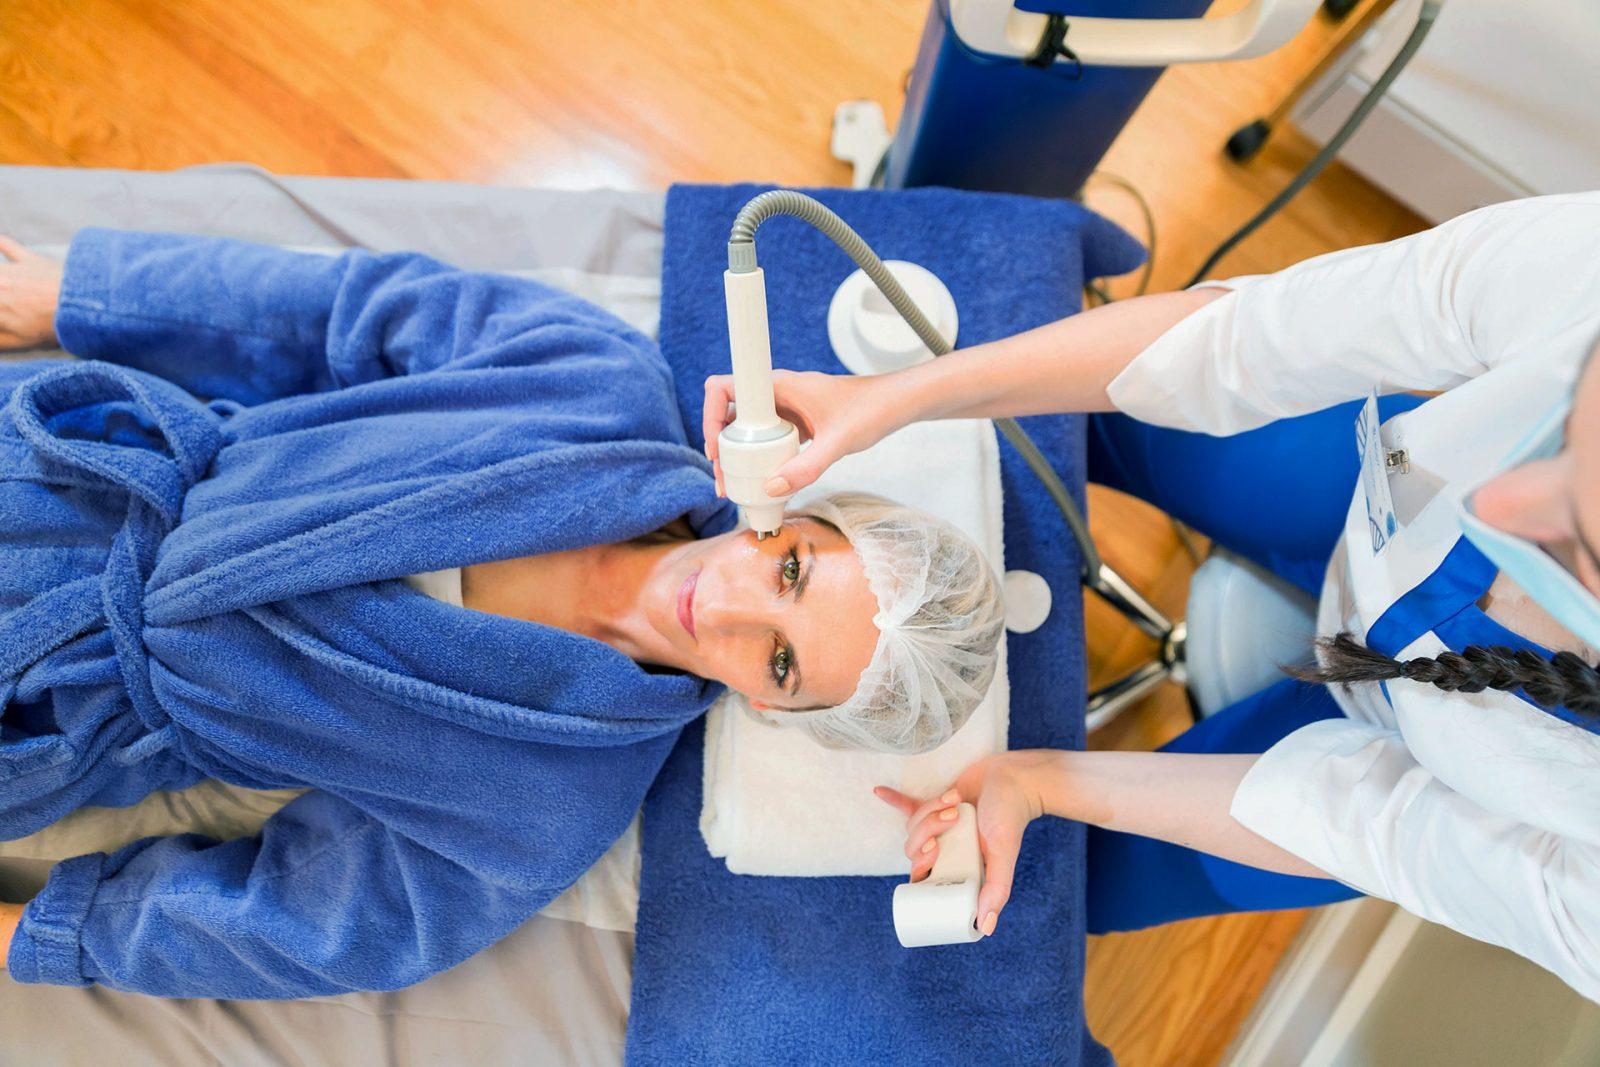 bodyscience-clinica-estetica-tratamentos-rosto-radiofrquencia-tripolar-cronus